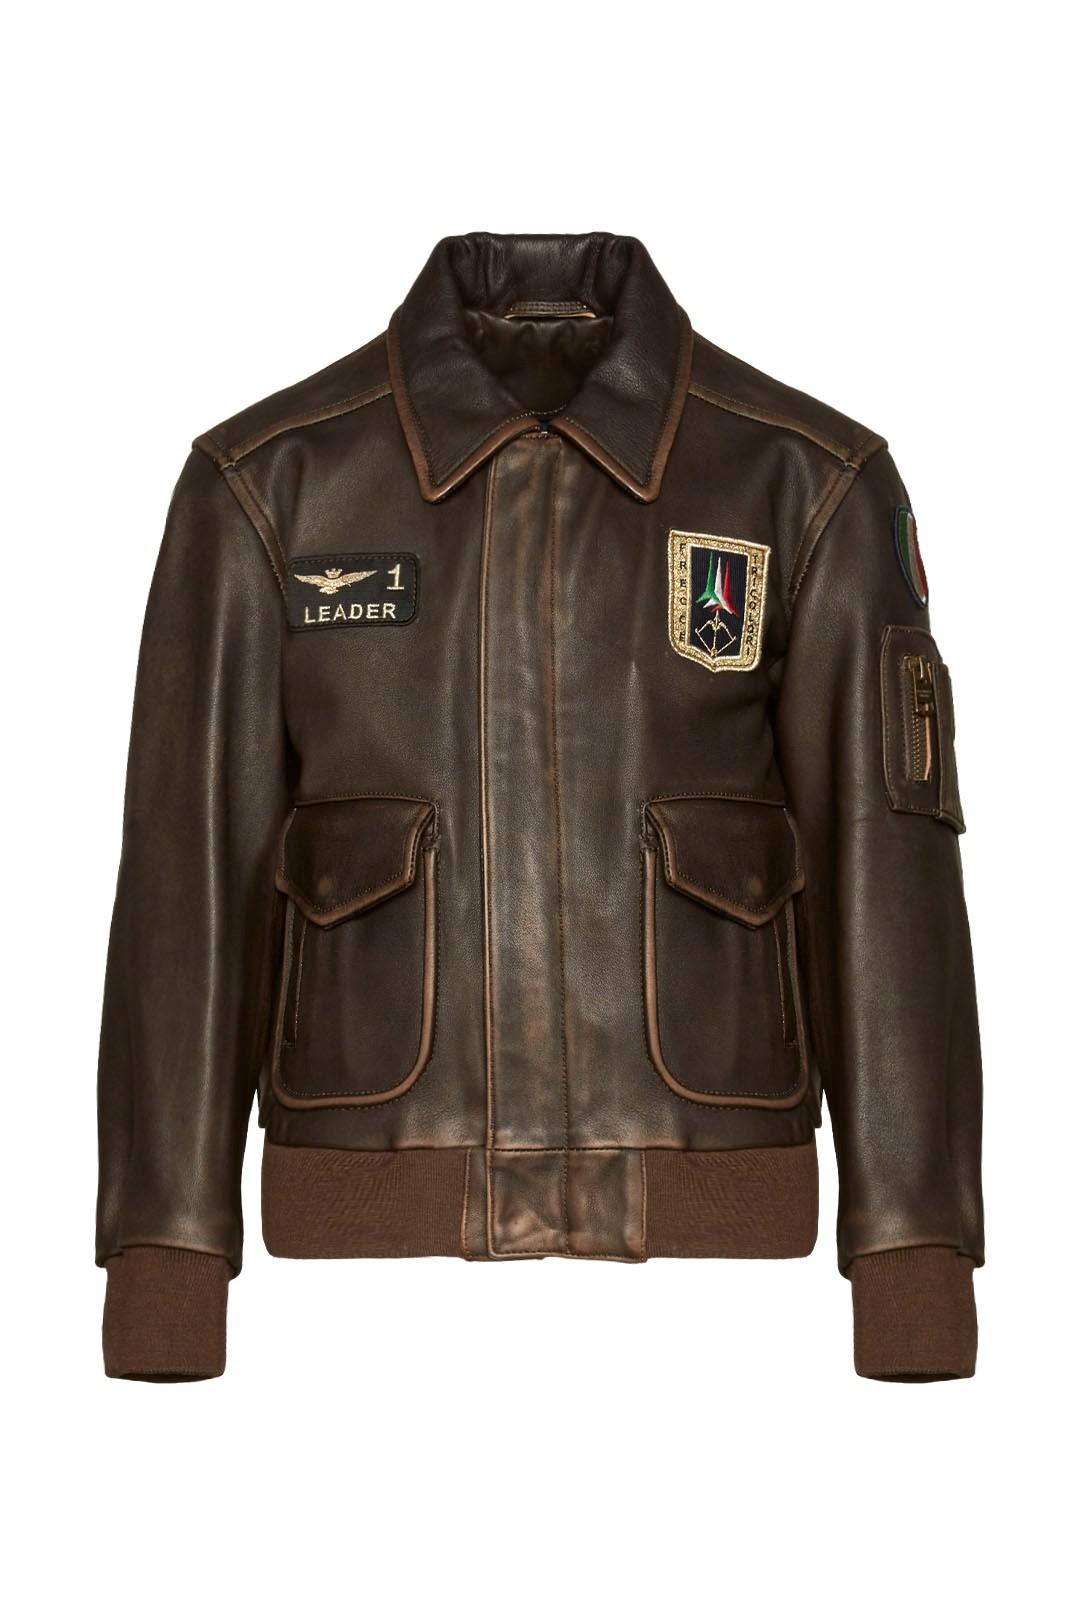 Kids Pilot leather jacket                1